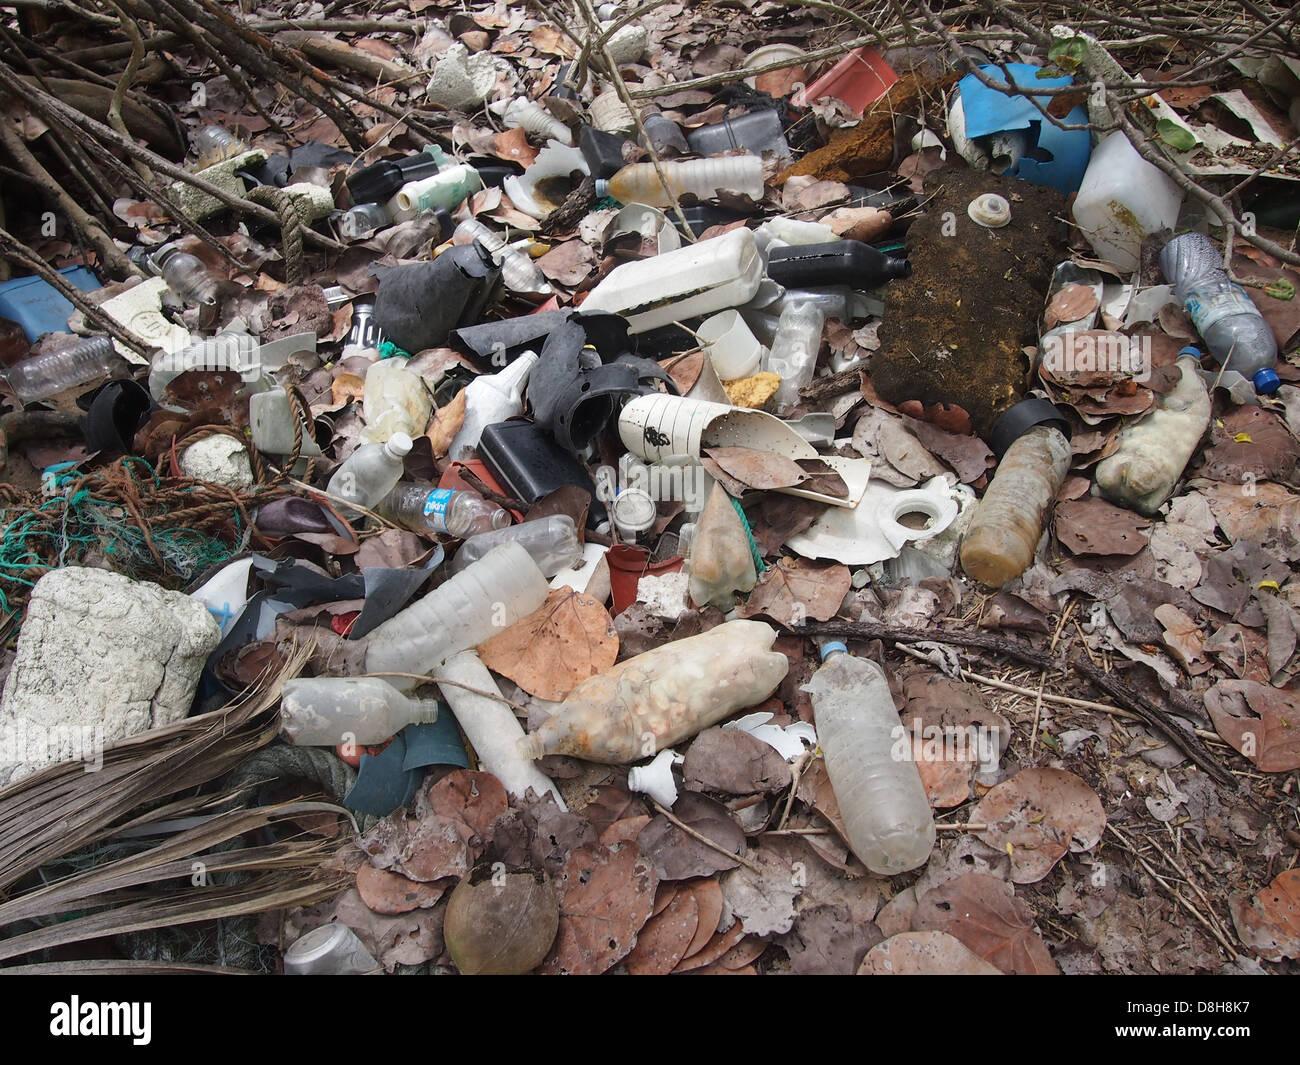 Litter from the ocean - Stock Image